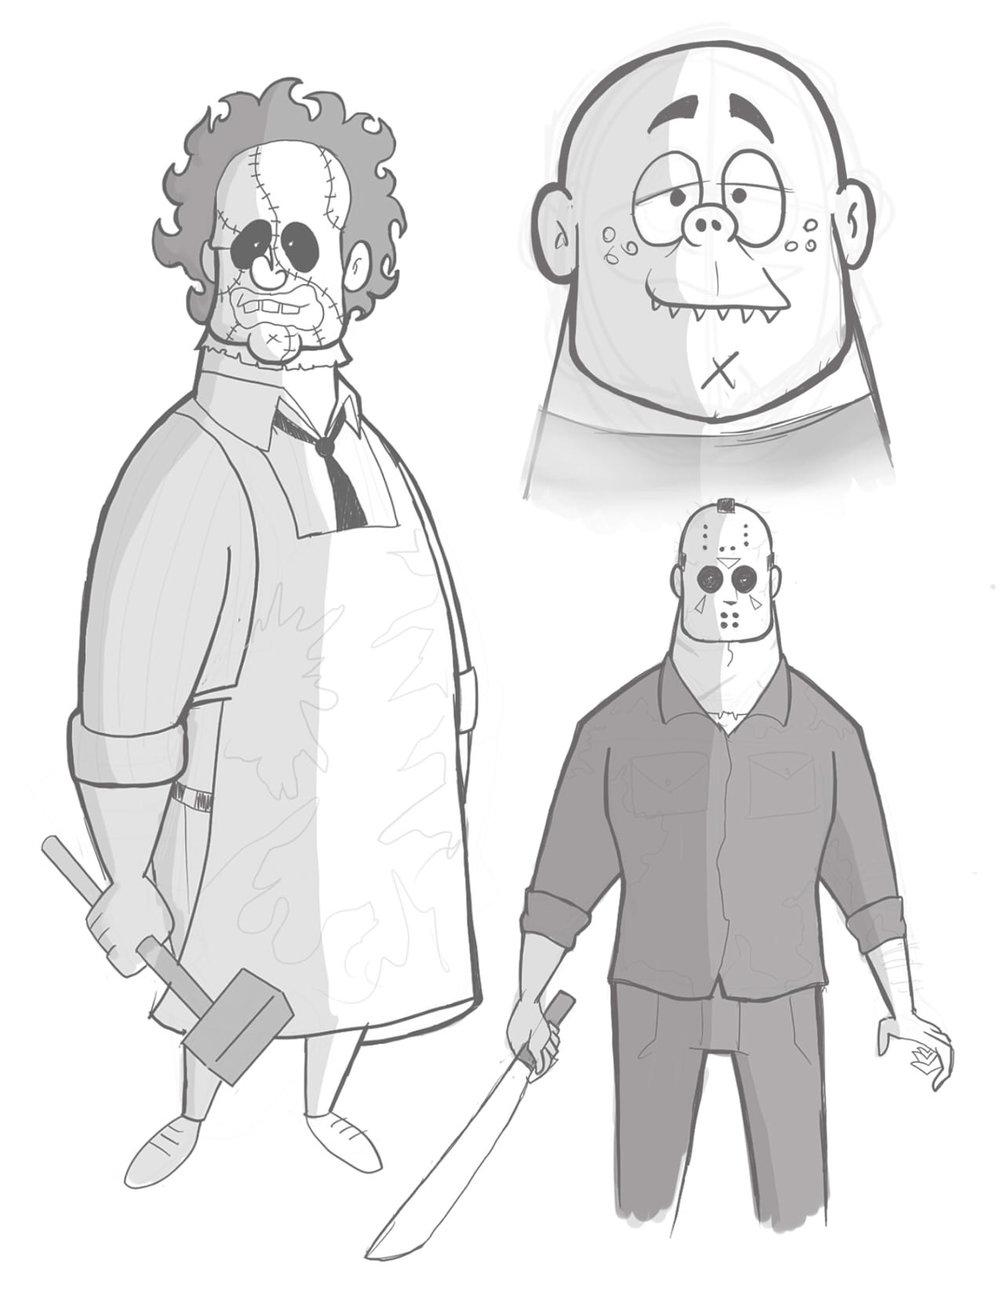 random sketches 169.jpg